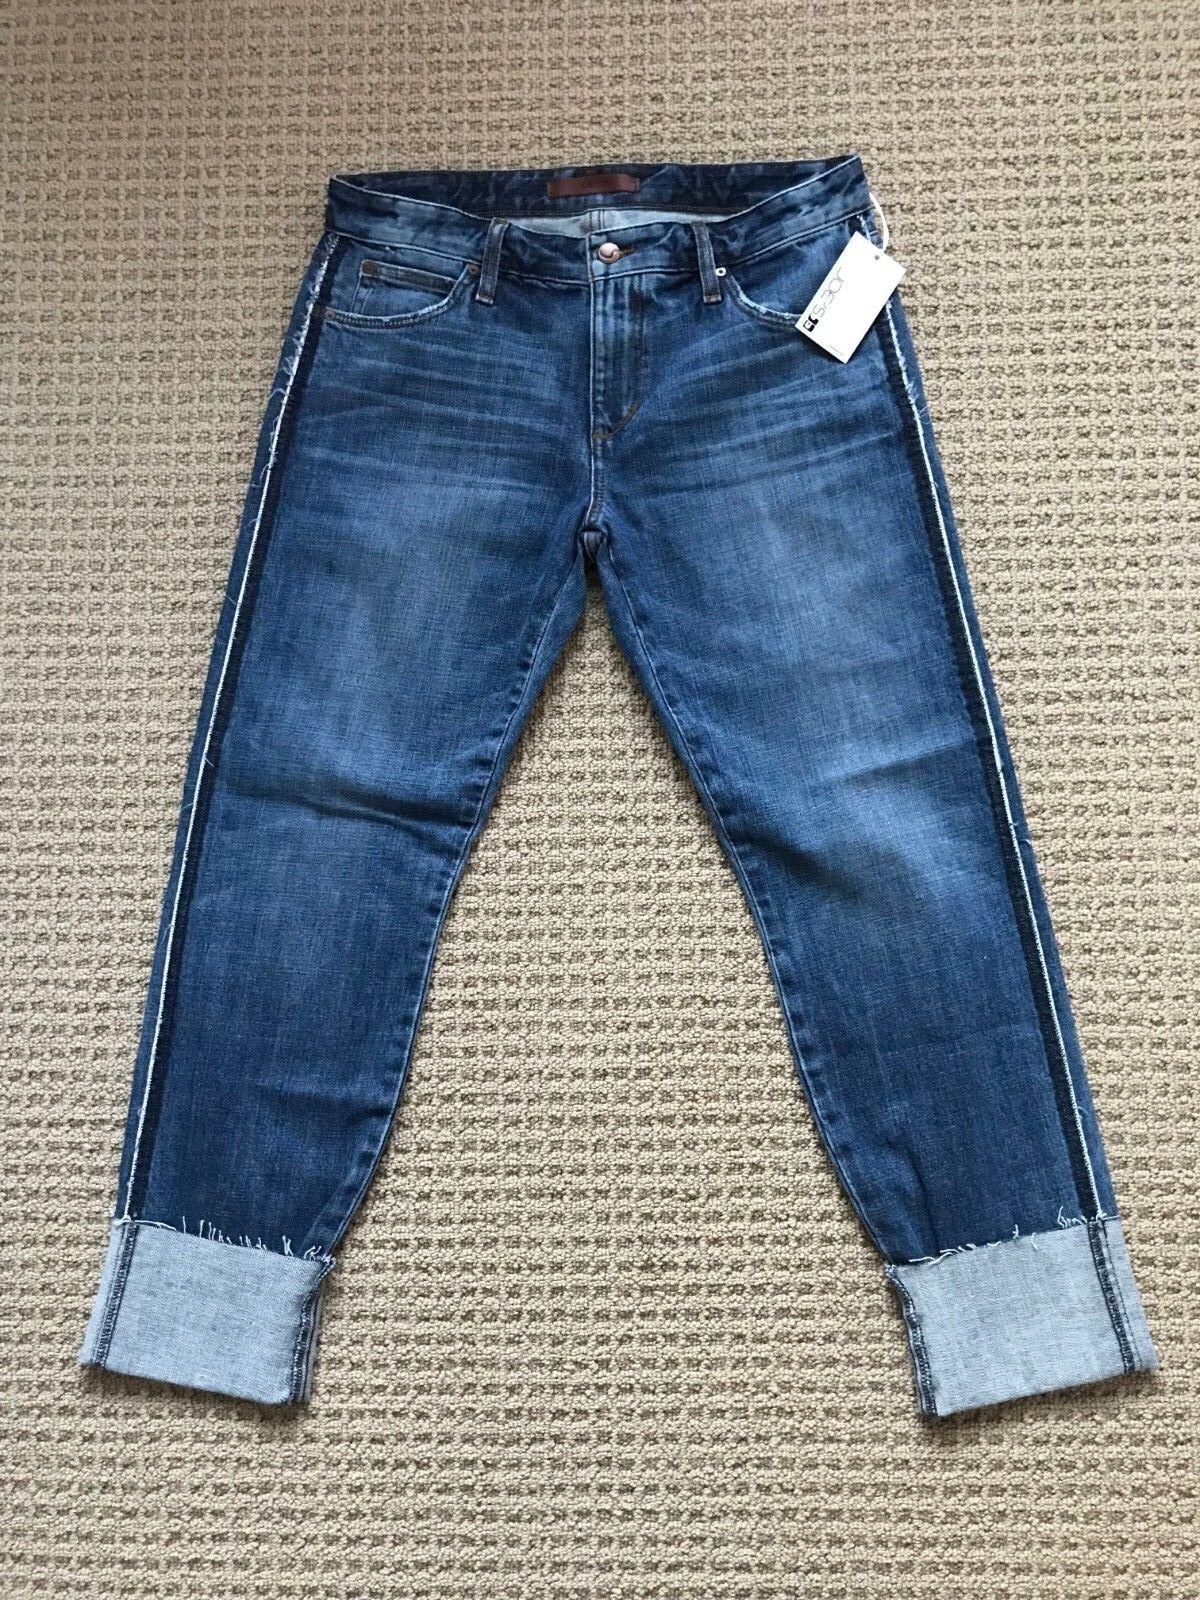 Jeans Joe's Ankle Boyfriend 29 Size Collector's Slim Edition WrxBCode